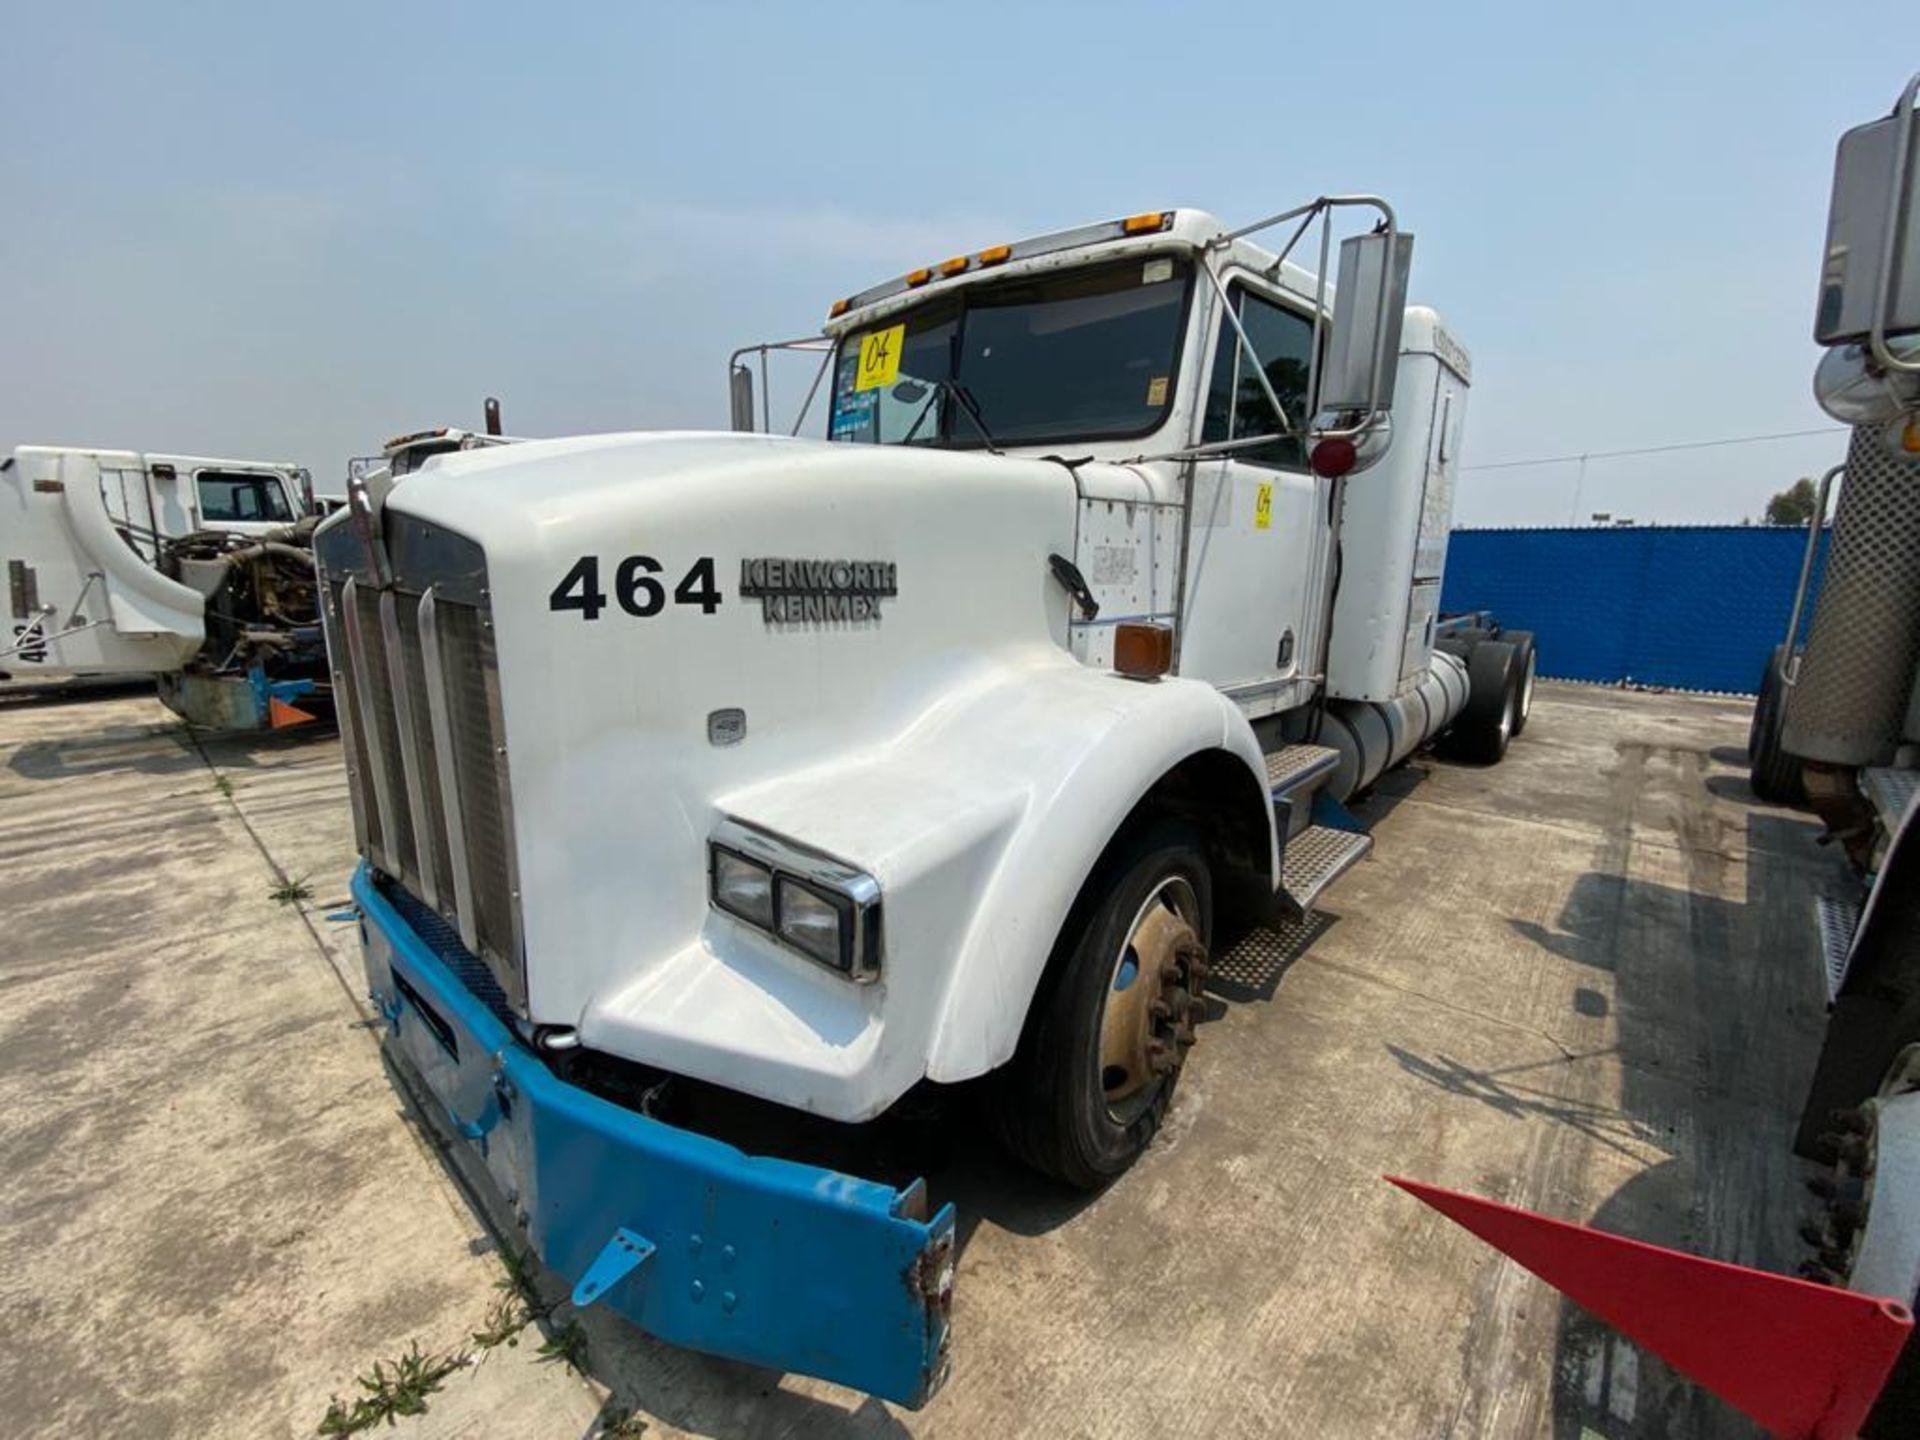 1999 Kenworth Sleeper truck tractor, standard transmission of 18 speeds - Image 49 of 70